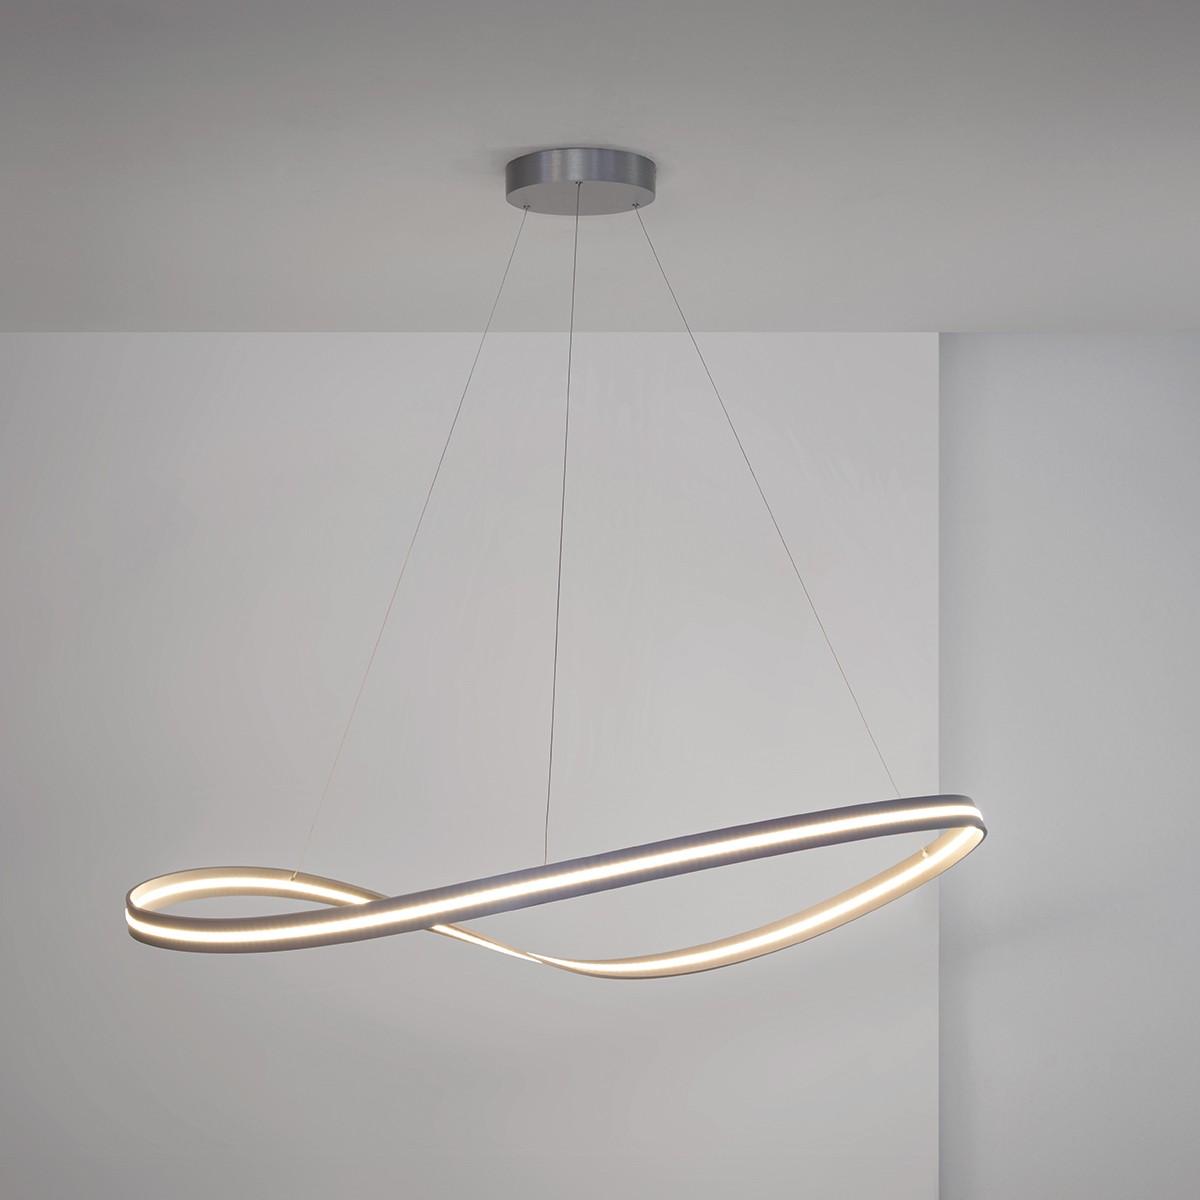 Escale Infinity Pendelleuchte, 105 x 80 cm, Alu geschliffen